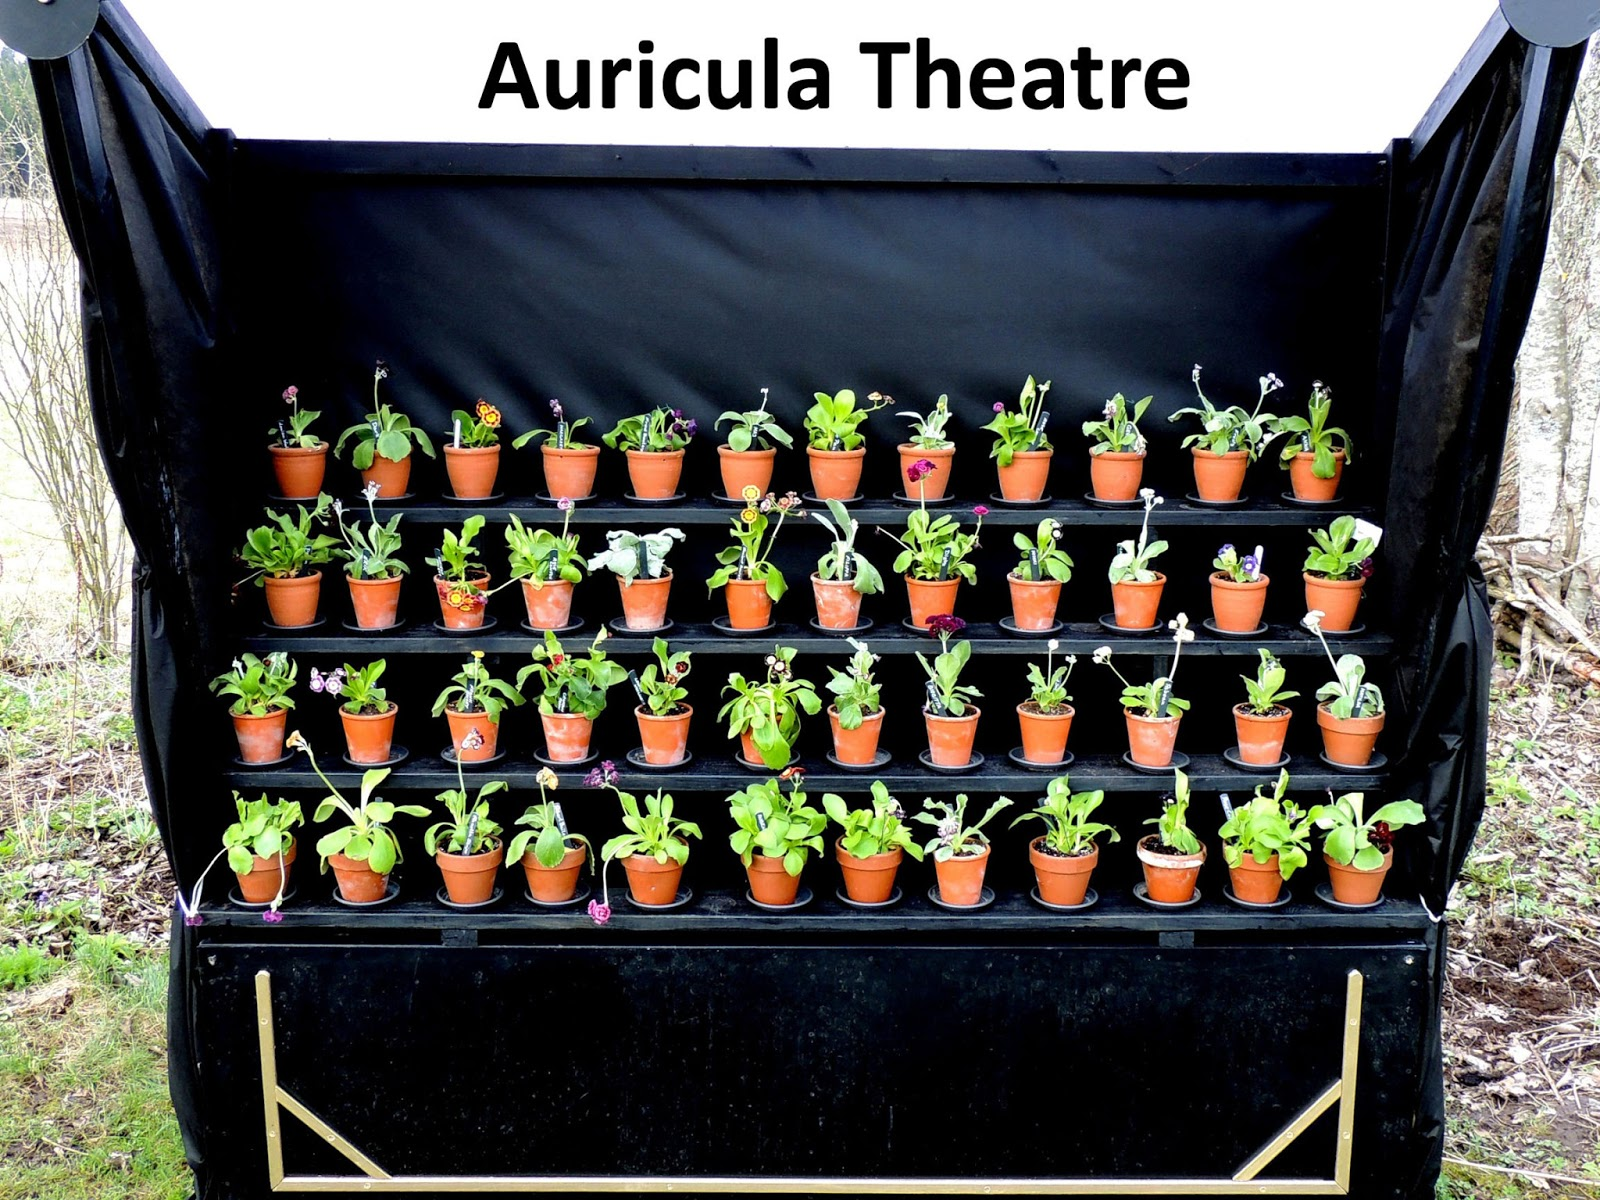 Sweden's auricula club: february 2013